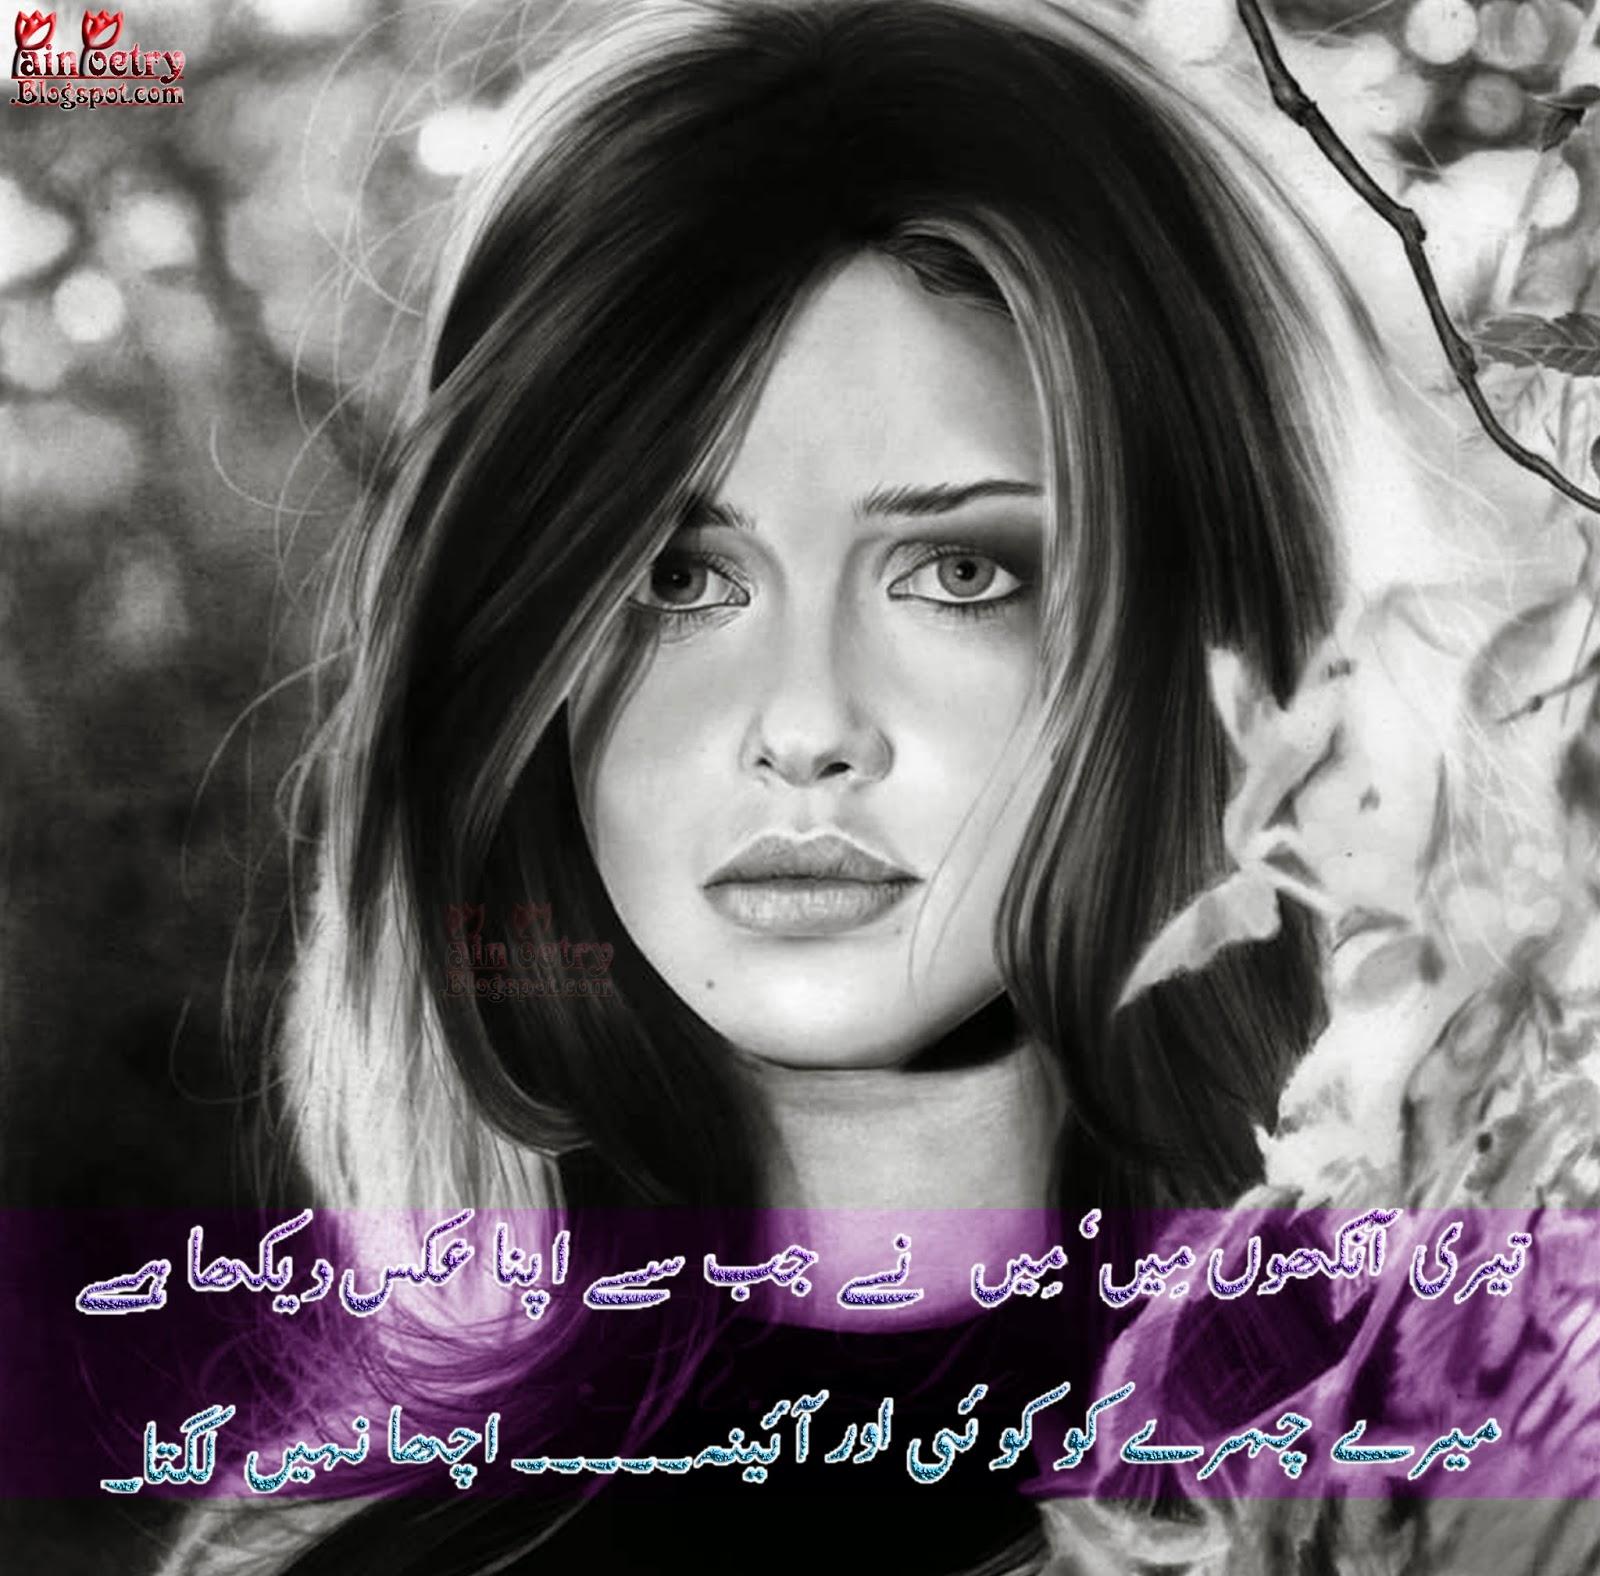 Sad-Love-Poetry-Teri-Aankhon-Mein-Mein-Ny-Jab-Sy-Apna-Aqs-Dekha-Hy-Mery-Chehry-Ko-Koi-Oor-Aaina-Acha-Nai-Lagta-Image-HD-Wide